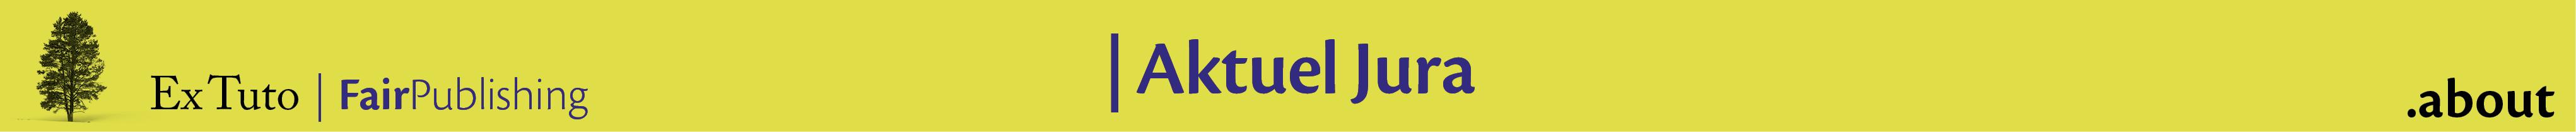 Ex Tuto banner